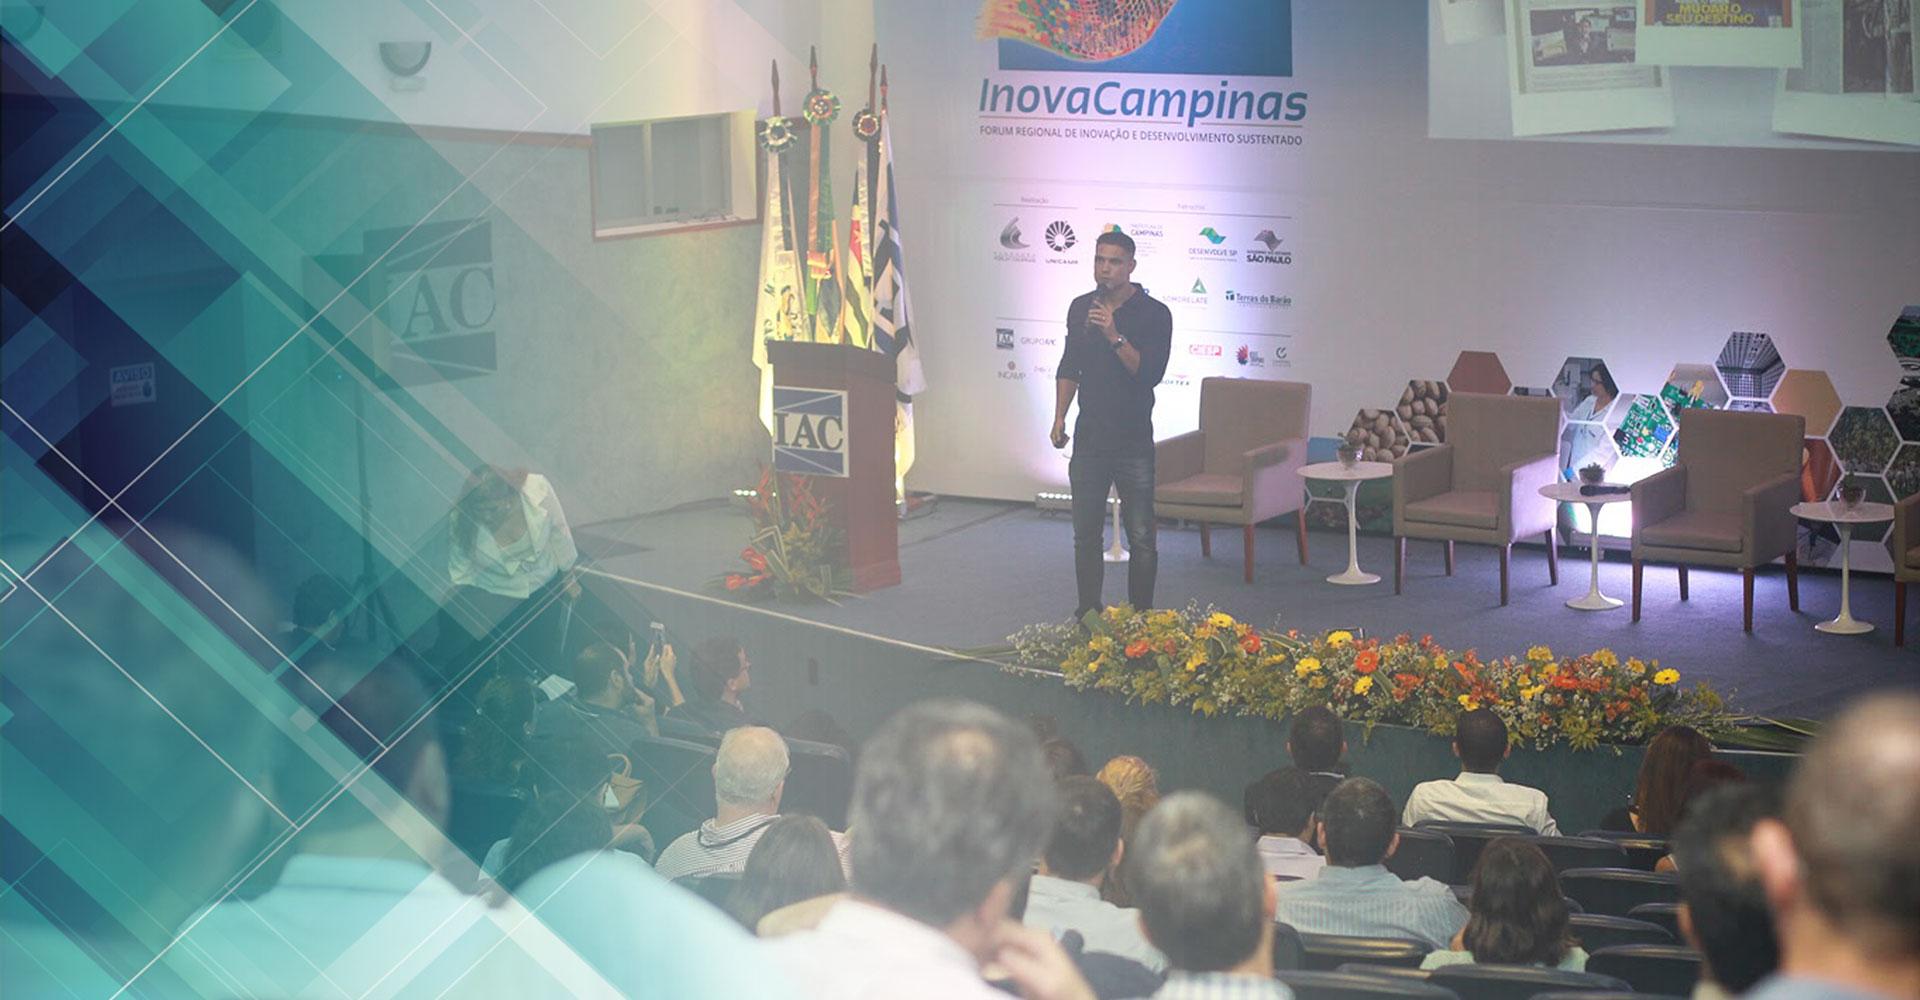 InovaCampinas